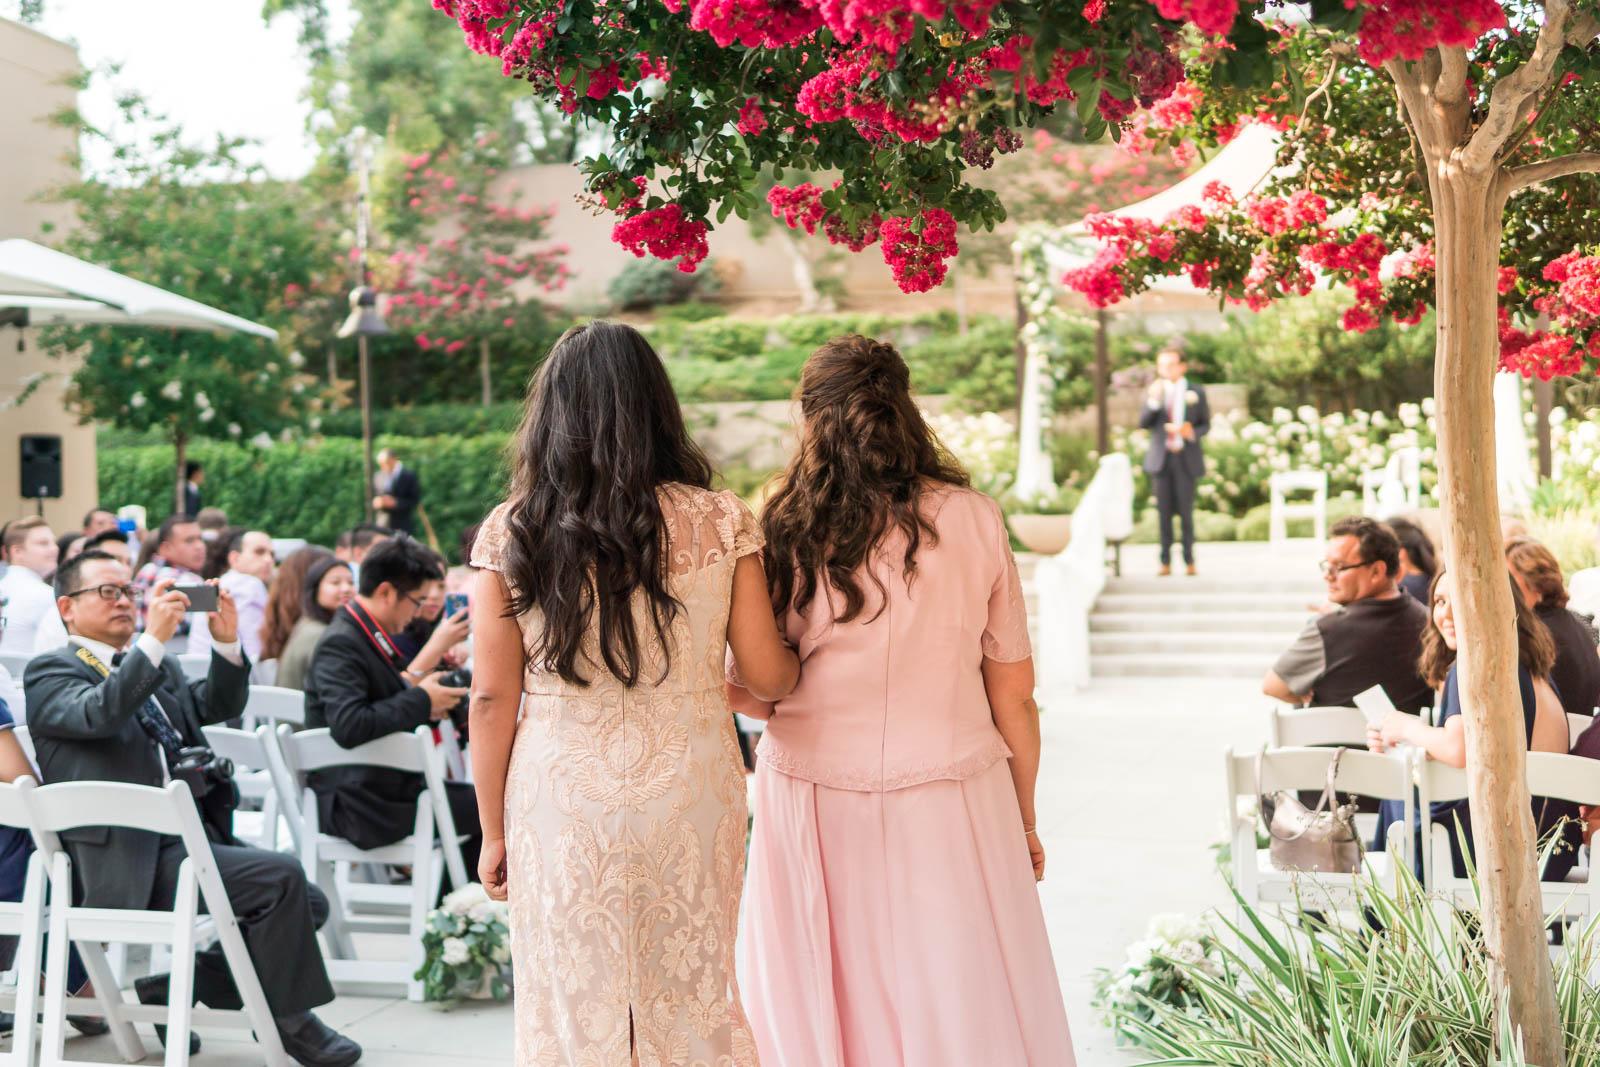 133_Angel-Brea-Orange-County_Joseph-Barber-Wedding-Photography.jpg